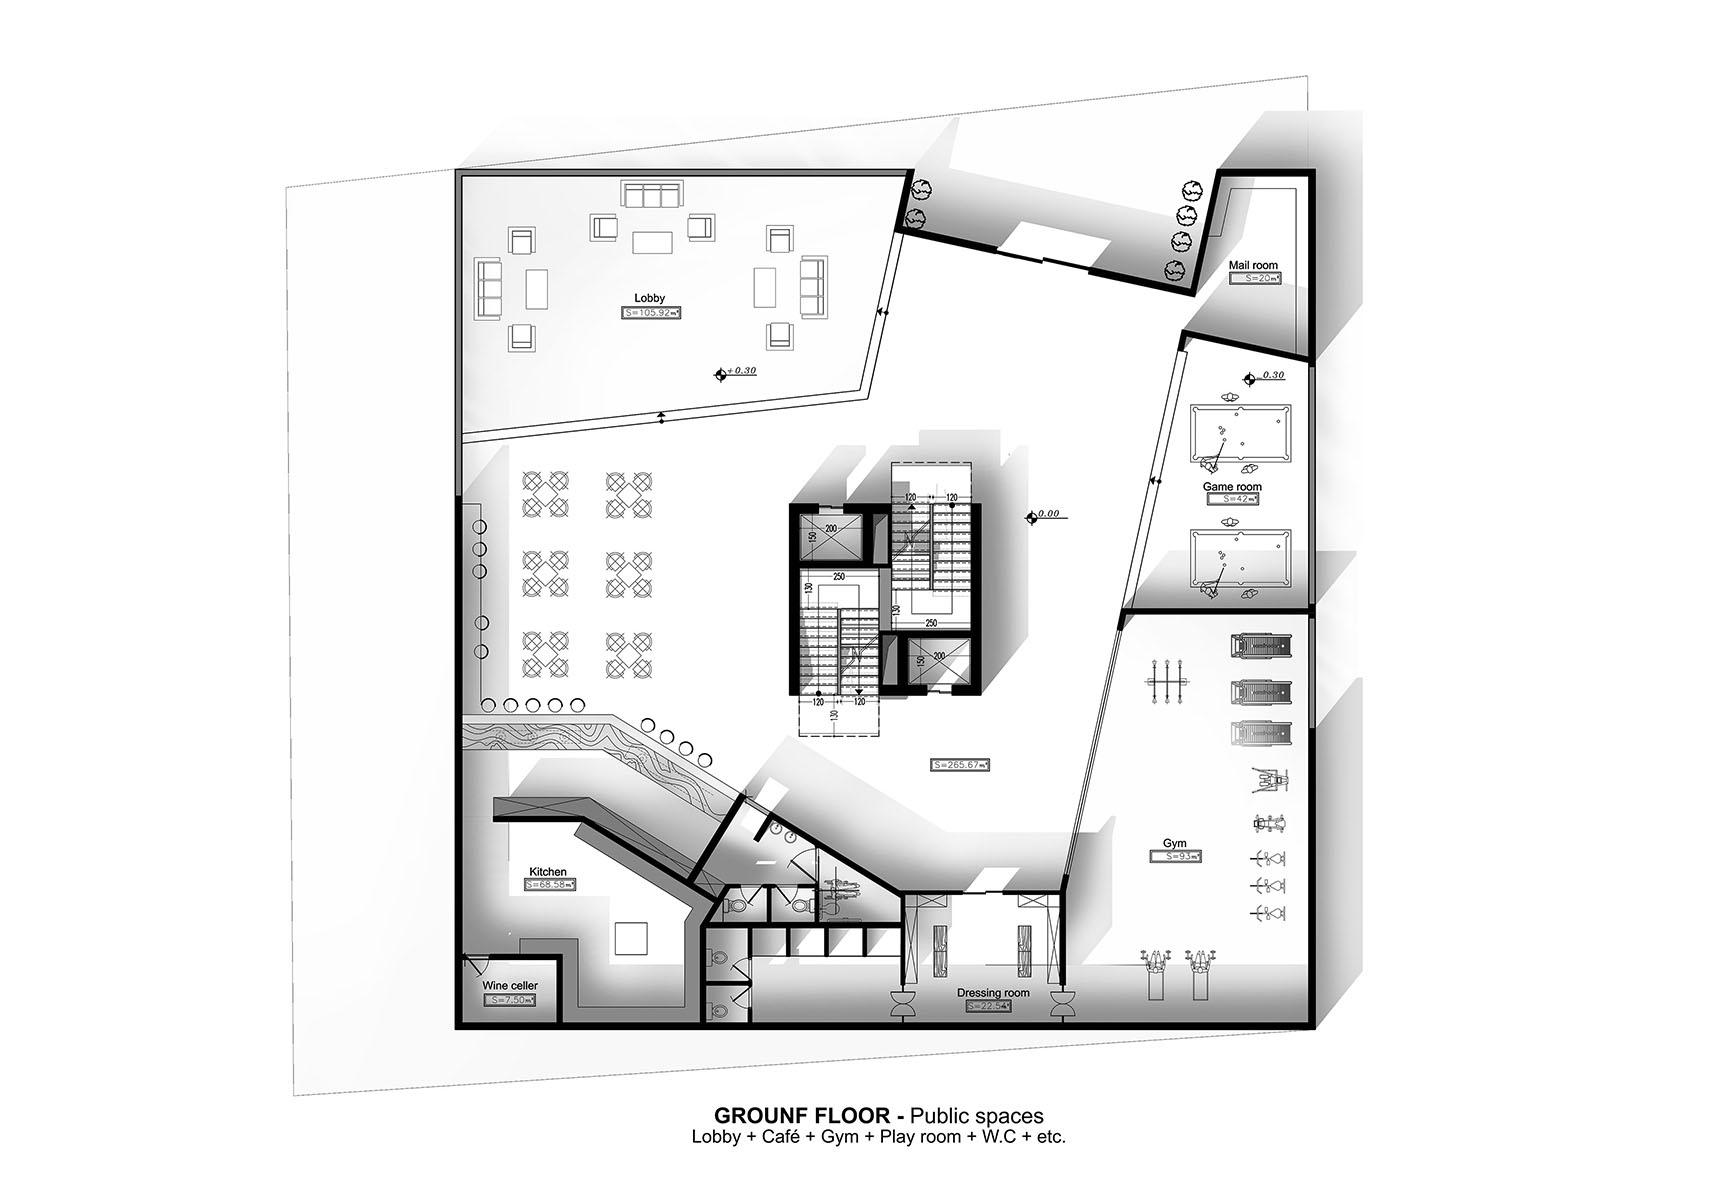 Genoa - A G Tehrani Design Studio - 06 - Section